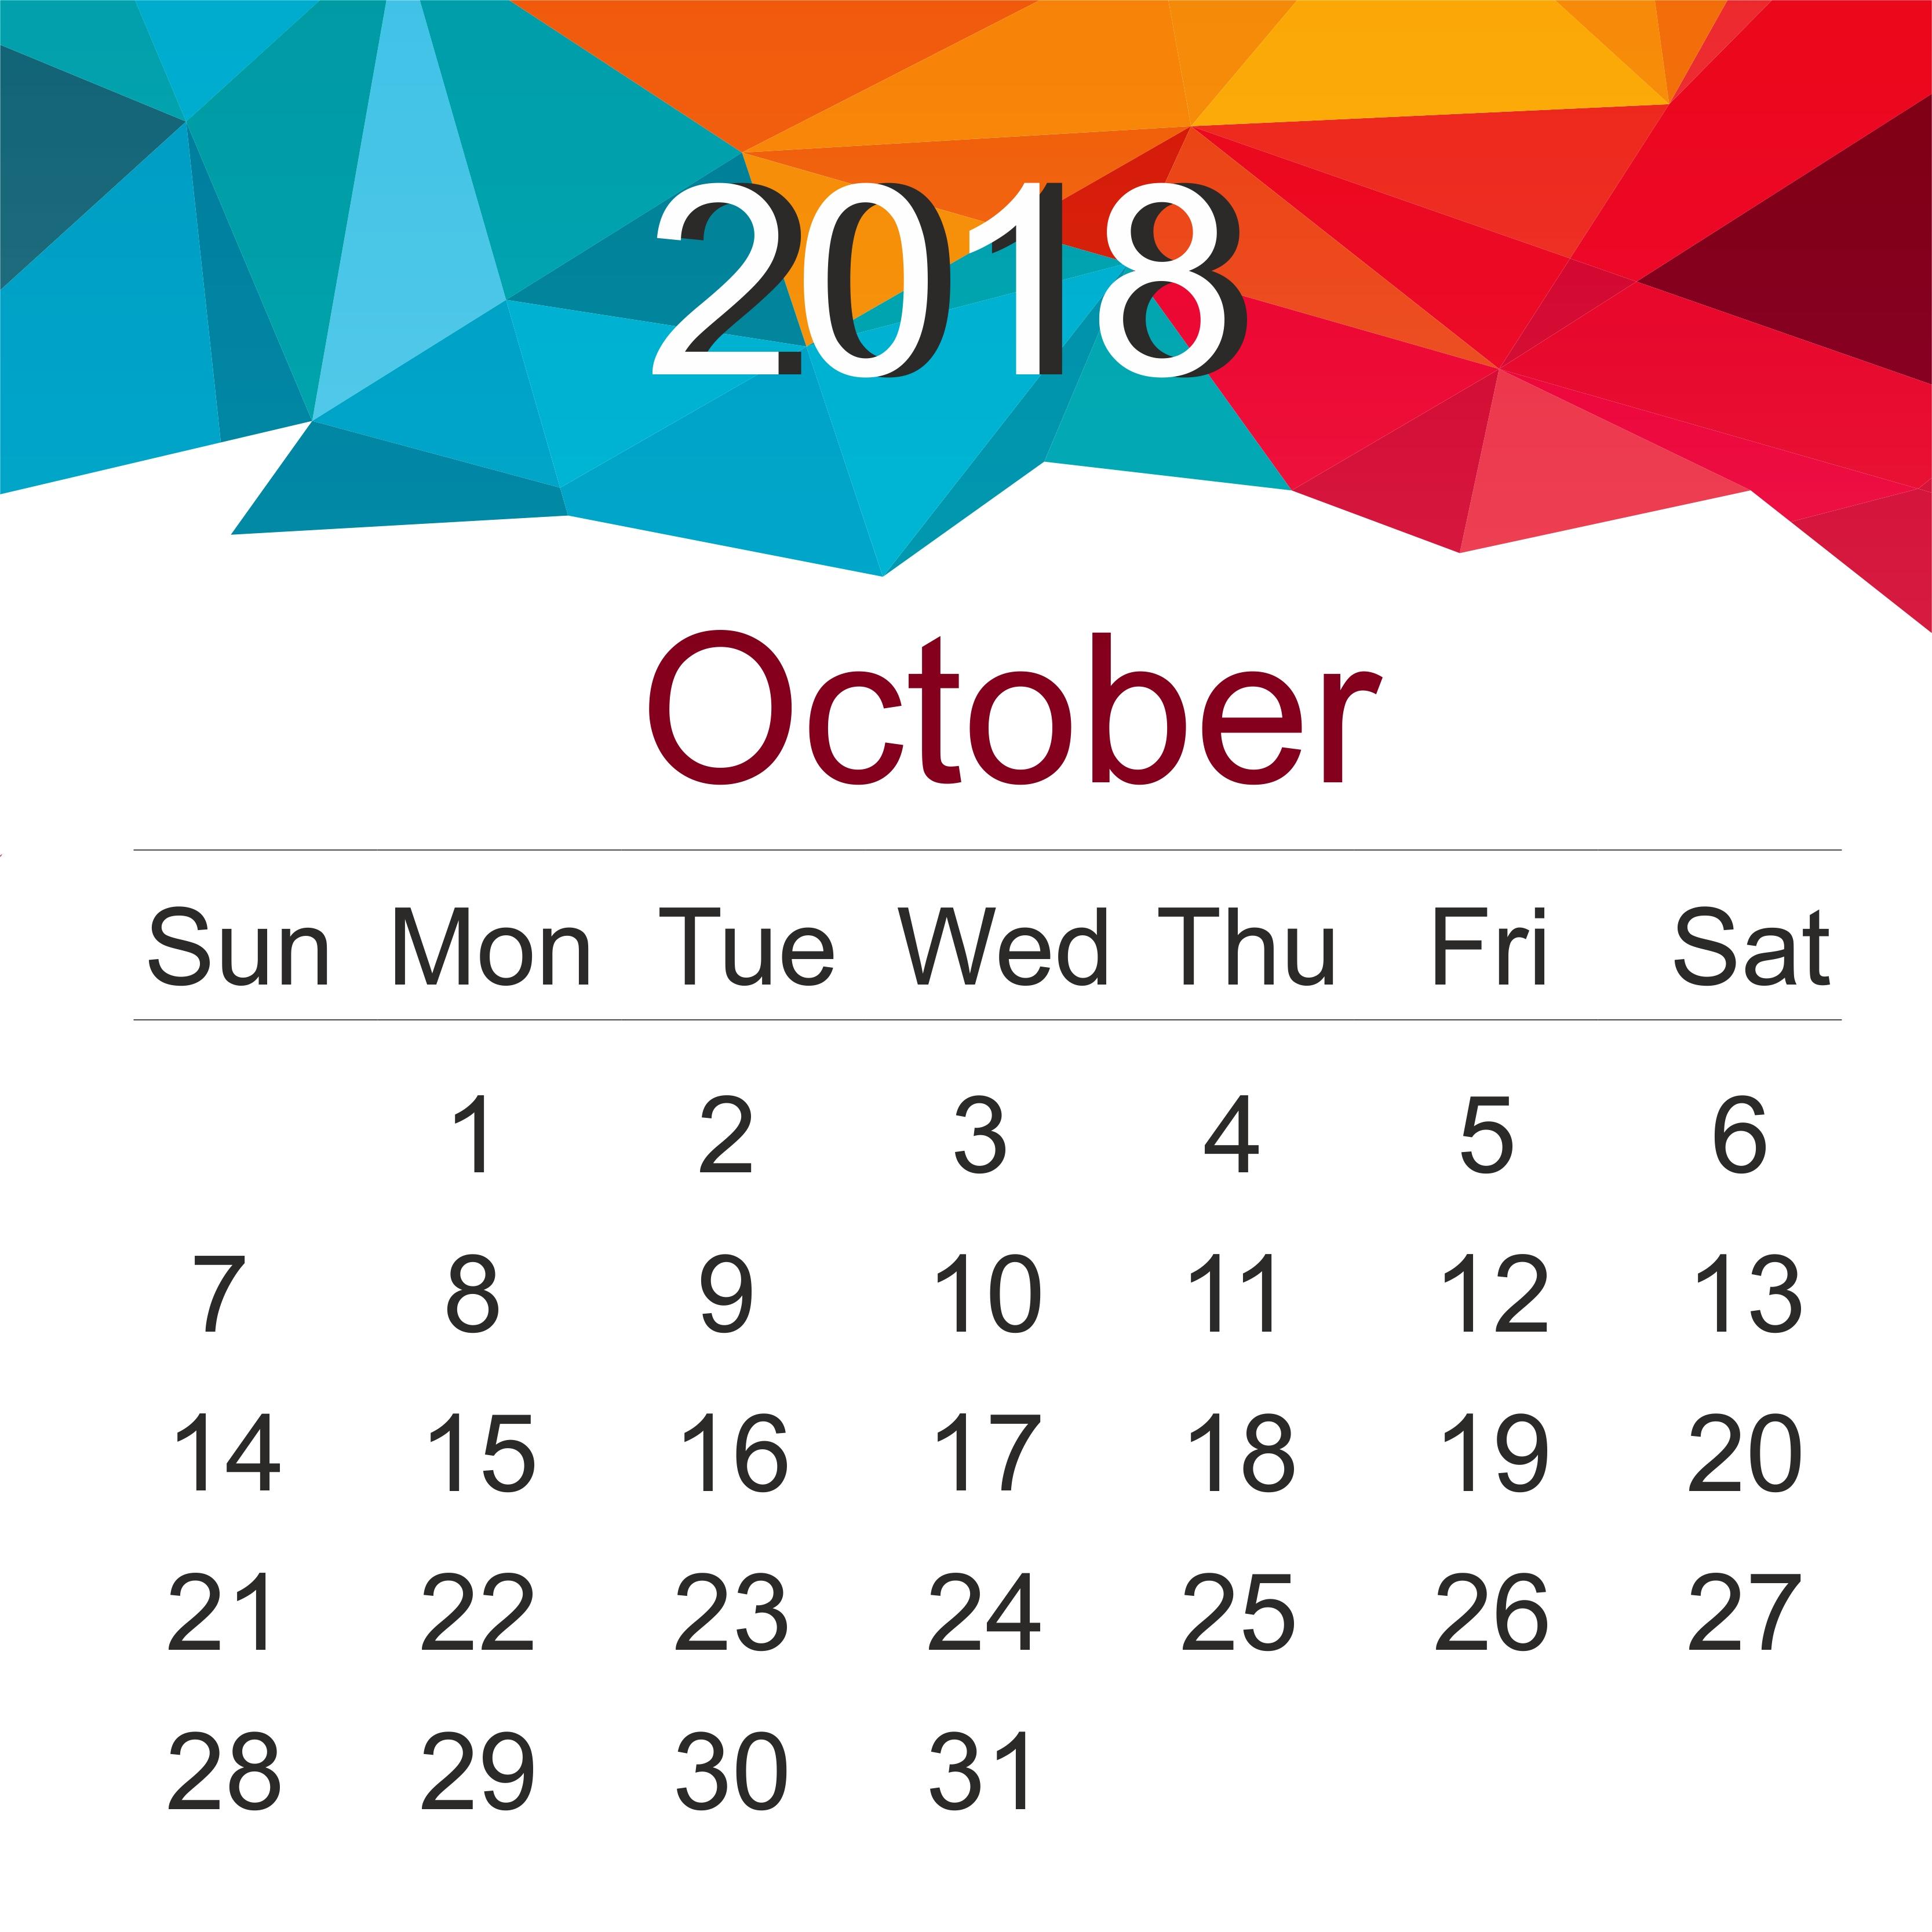 october 2018 calendar october 2018 printable calendar october Printable October 2018 Calendar erdferdf